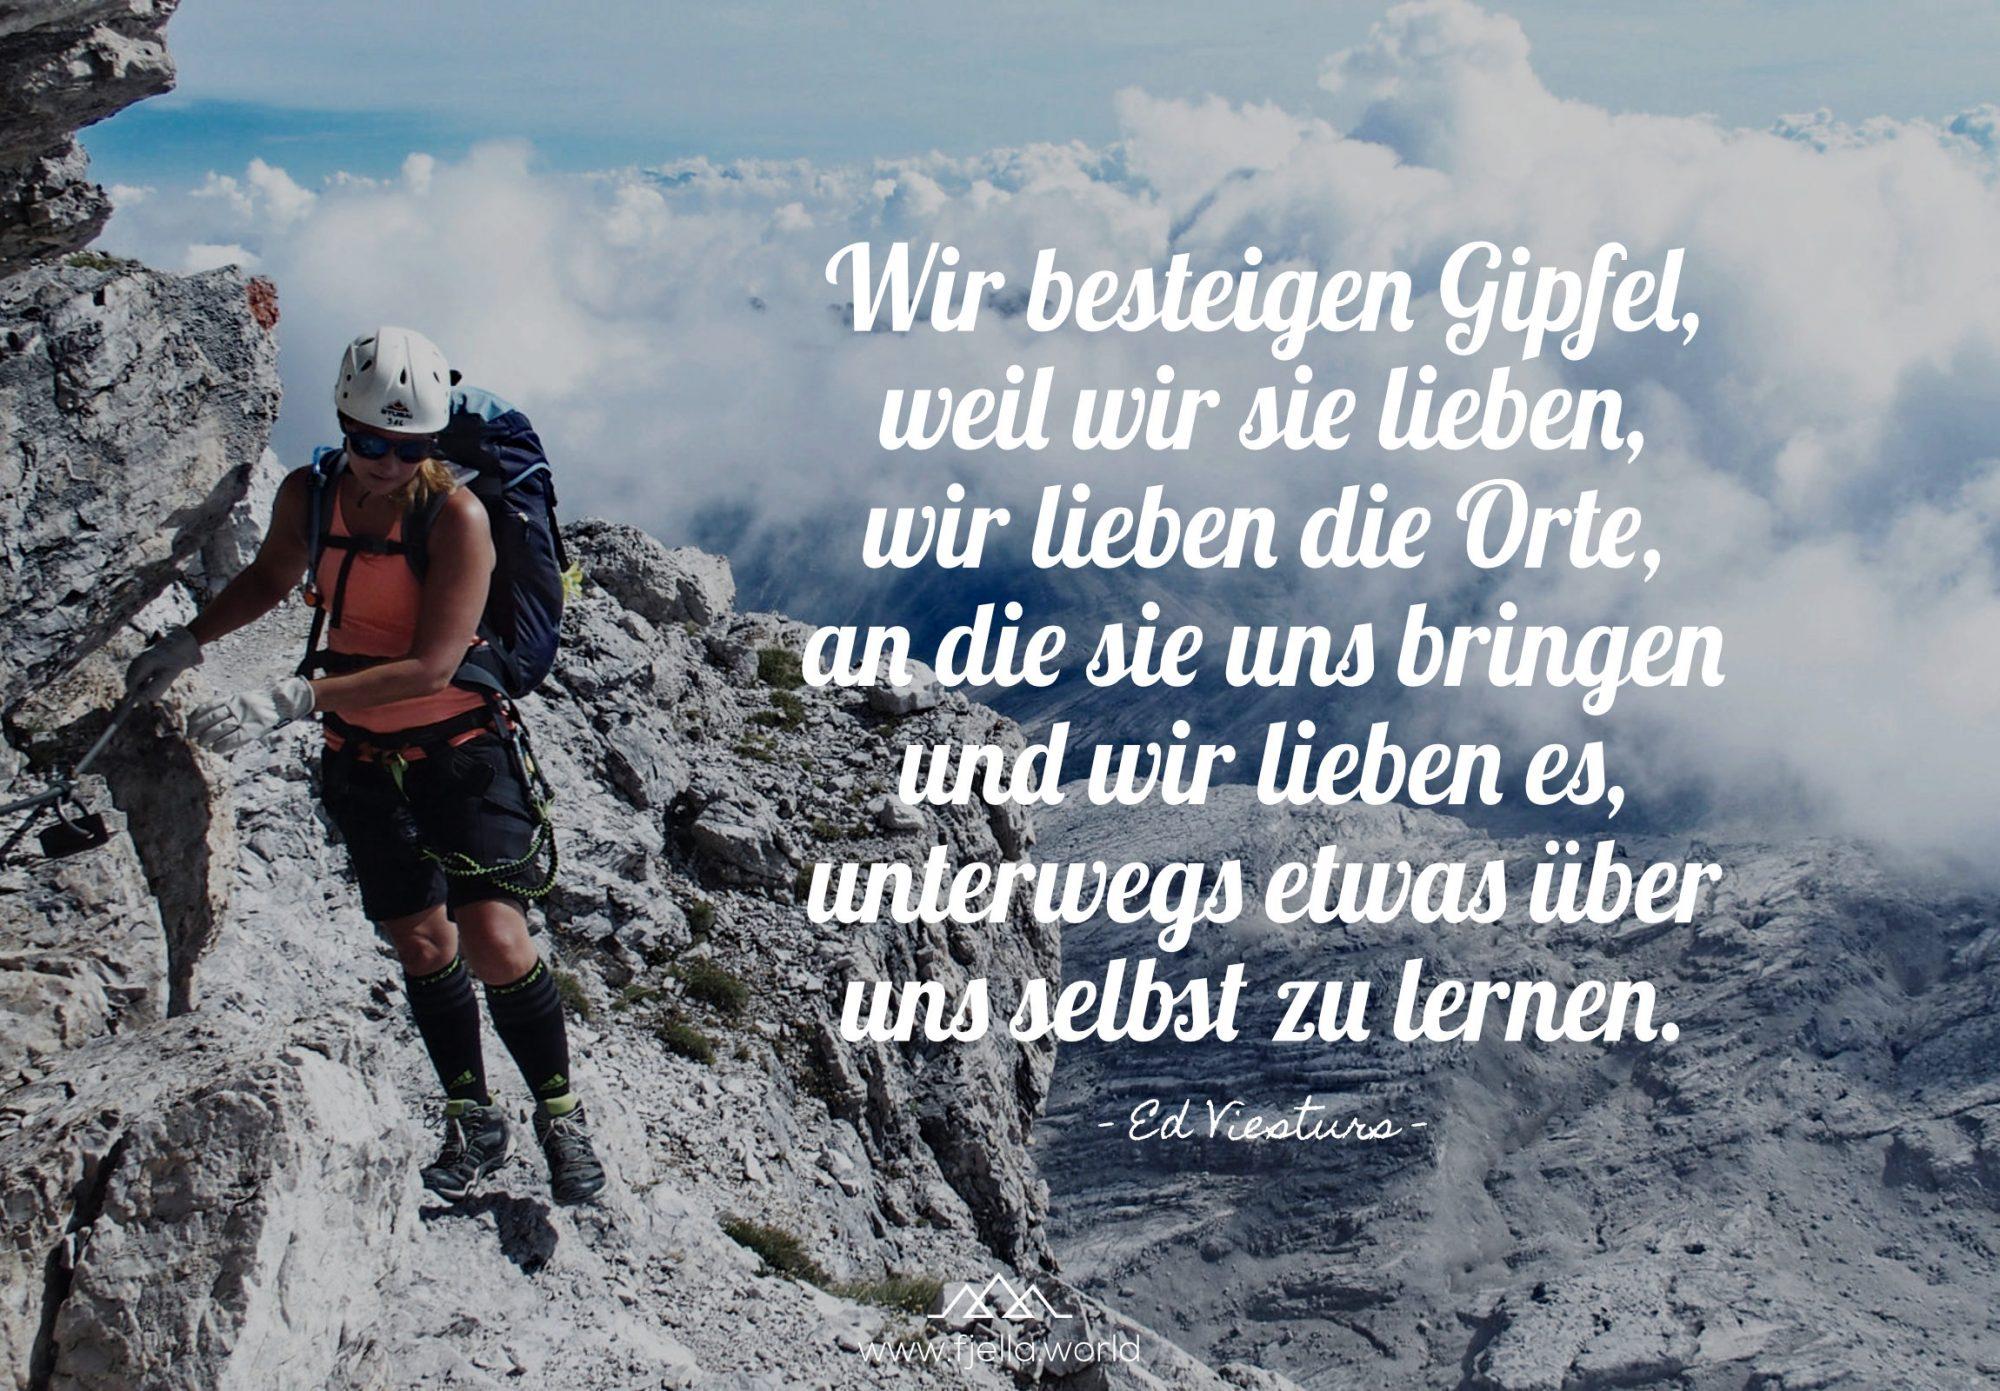 Wandersprüche, Sprüche Wandern, Zitate Wandern, Wanderzitate, Bergzitate, Motivation Zitate, Inspiration Zitate, Motivation Sprüche, Bergsprüche